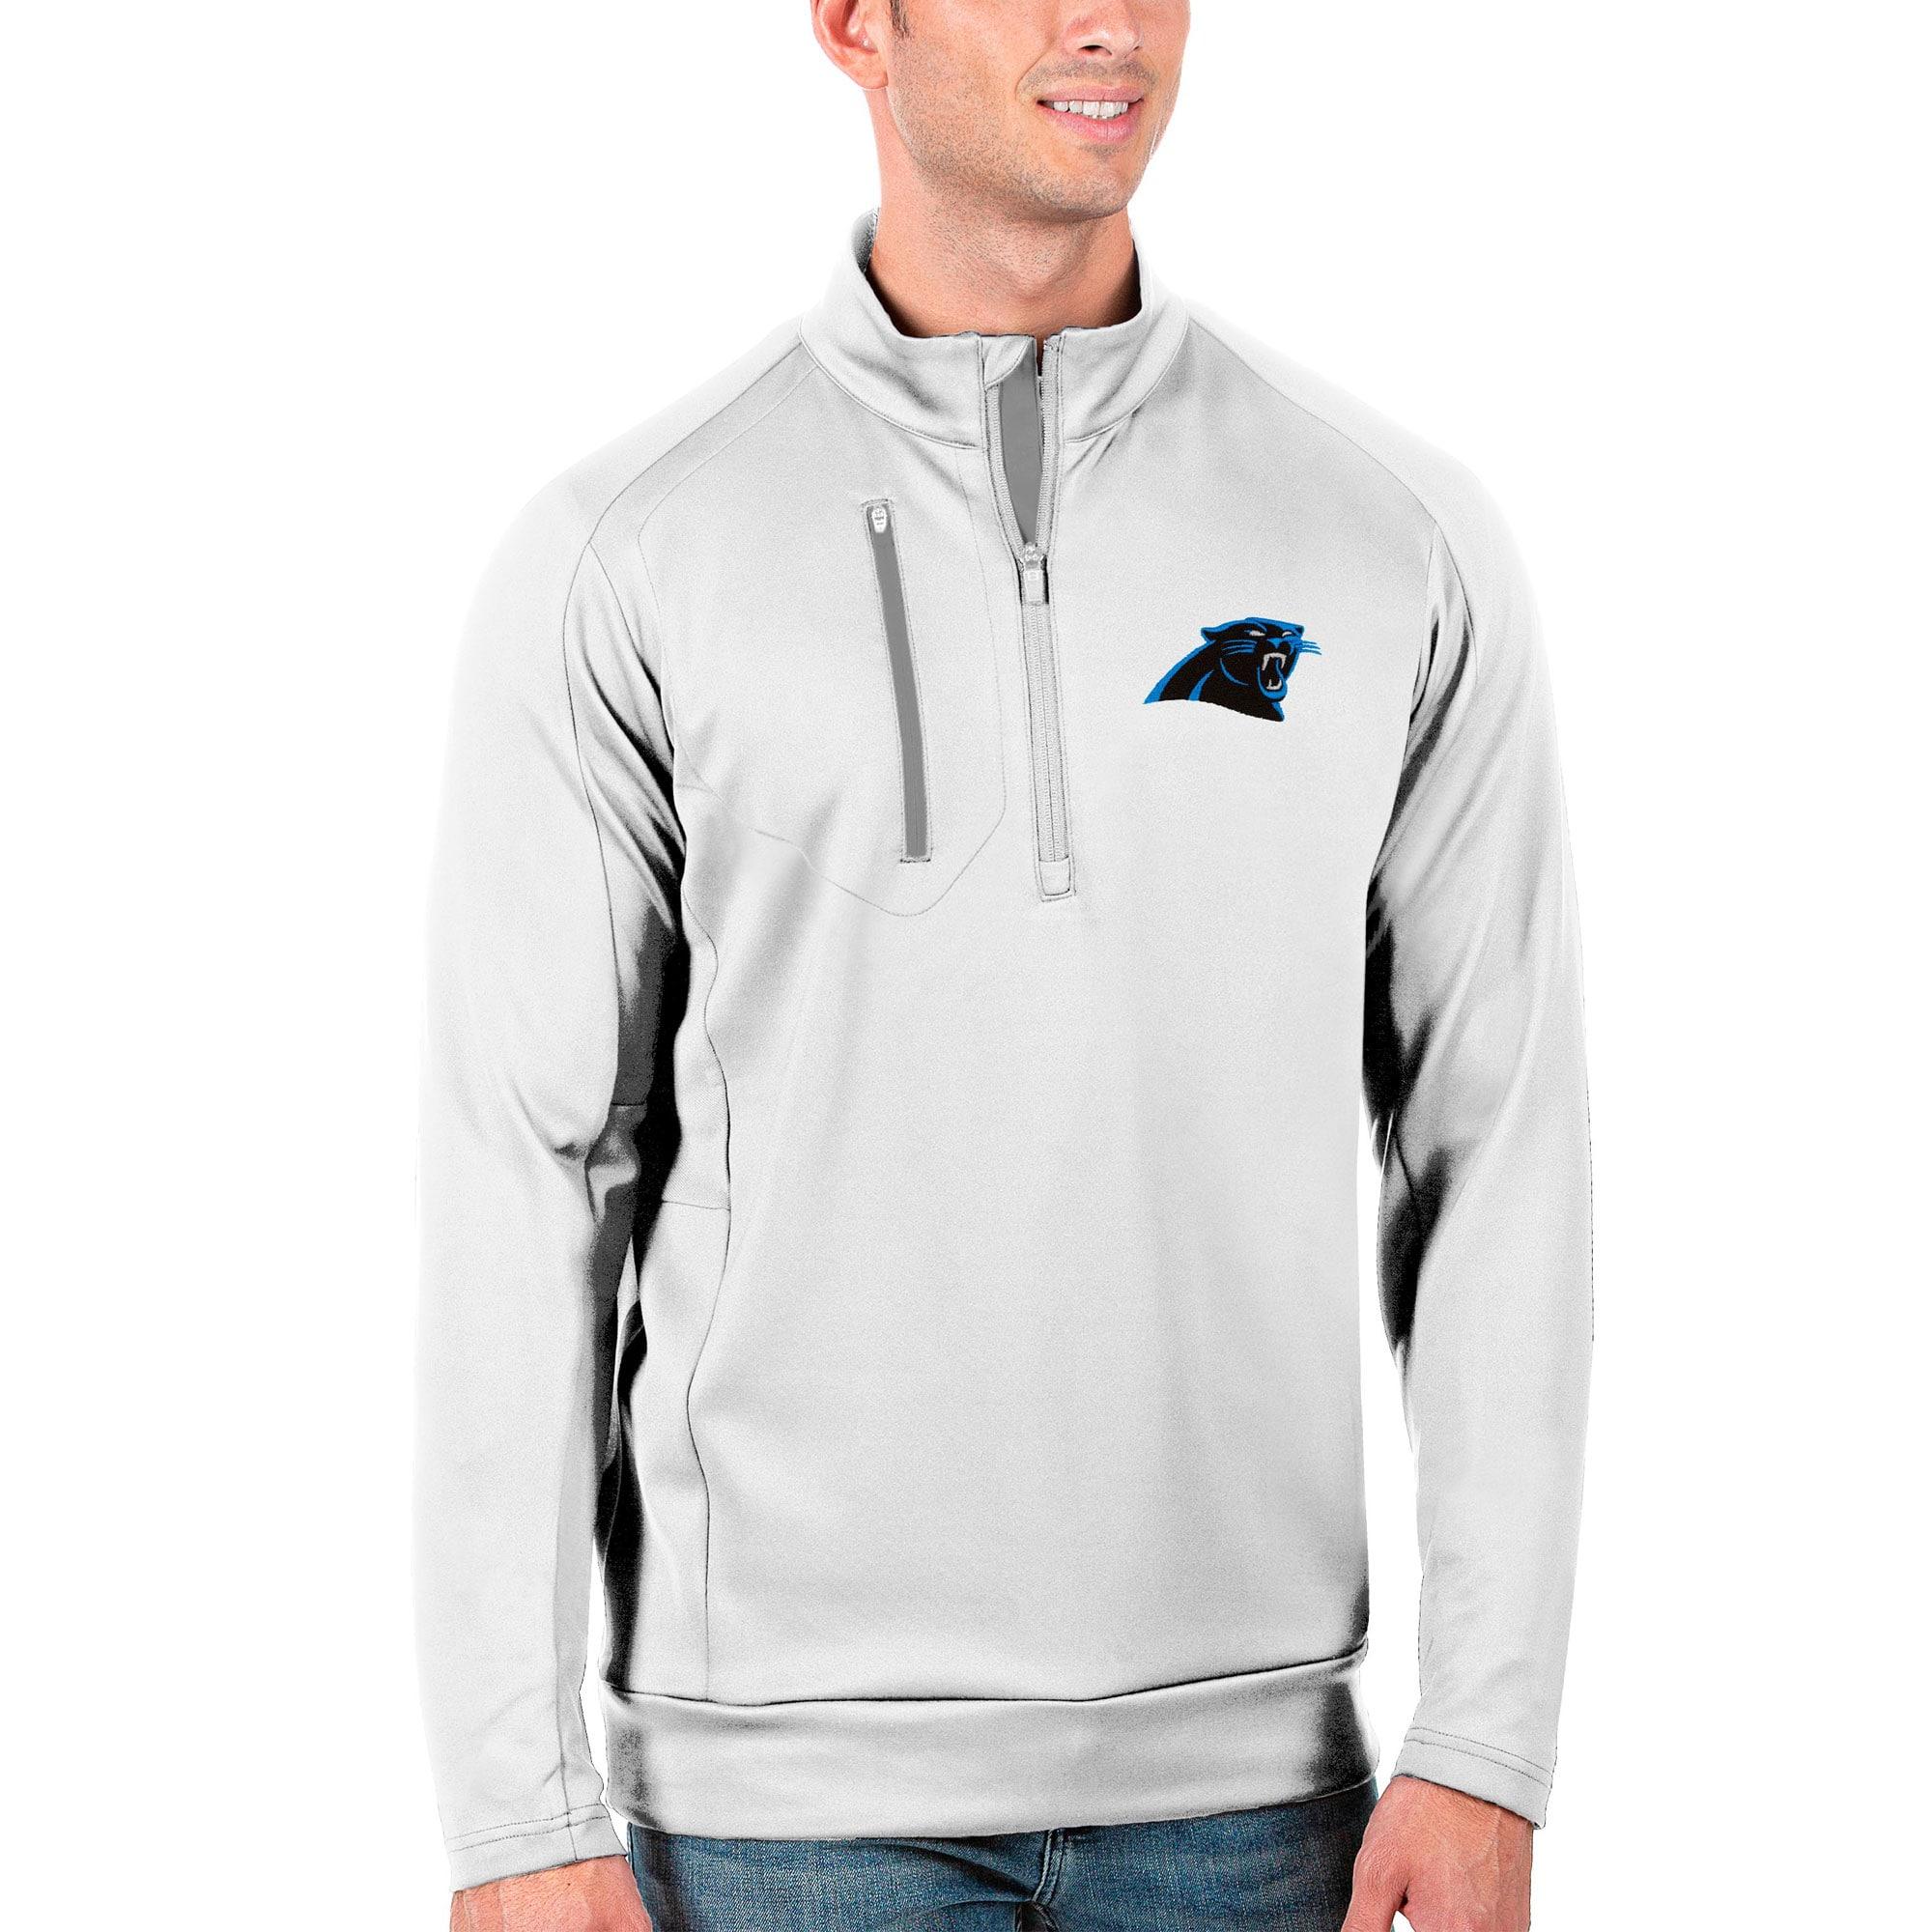 Carolina Panthers Antigua Generation Quarter-Zip Pullover Jacket - White/Silver